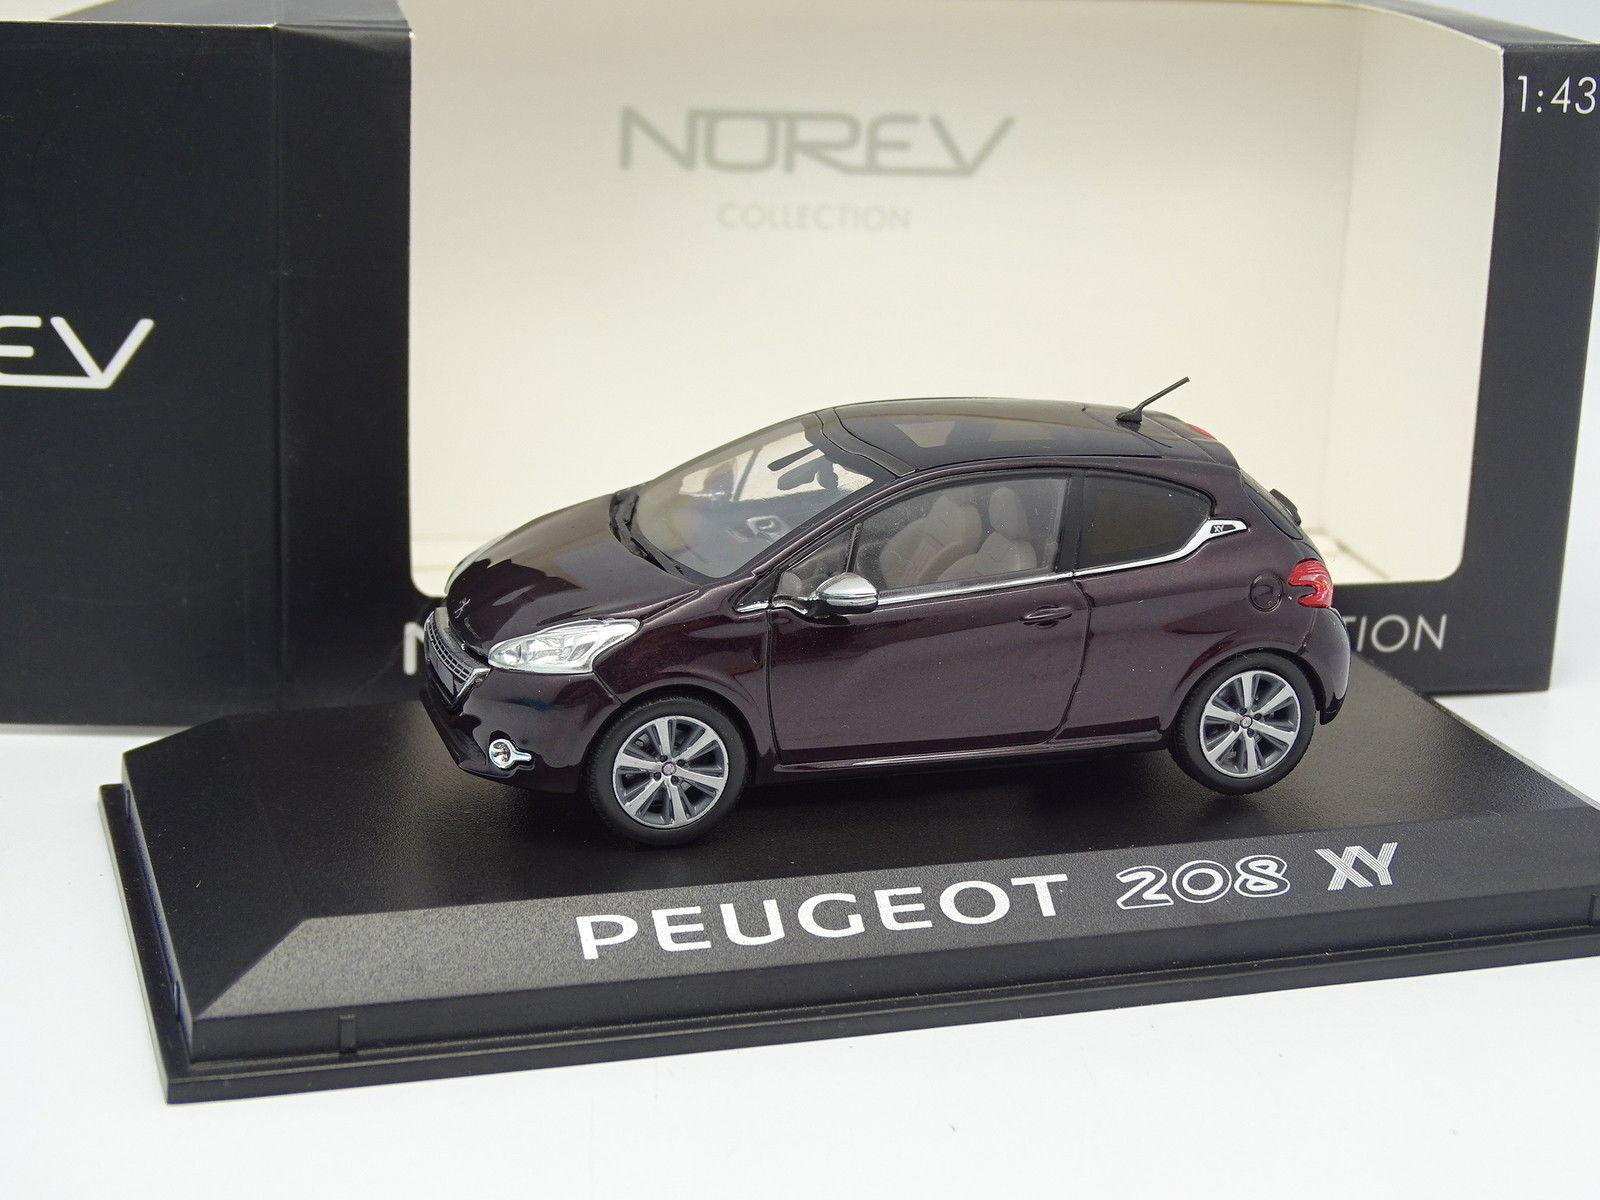 Norev 1 43 - peugeot 208 XY